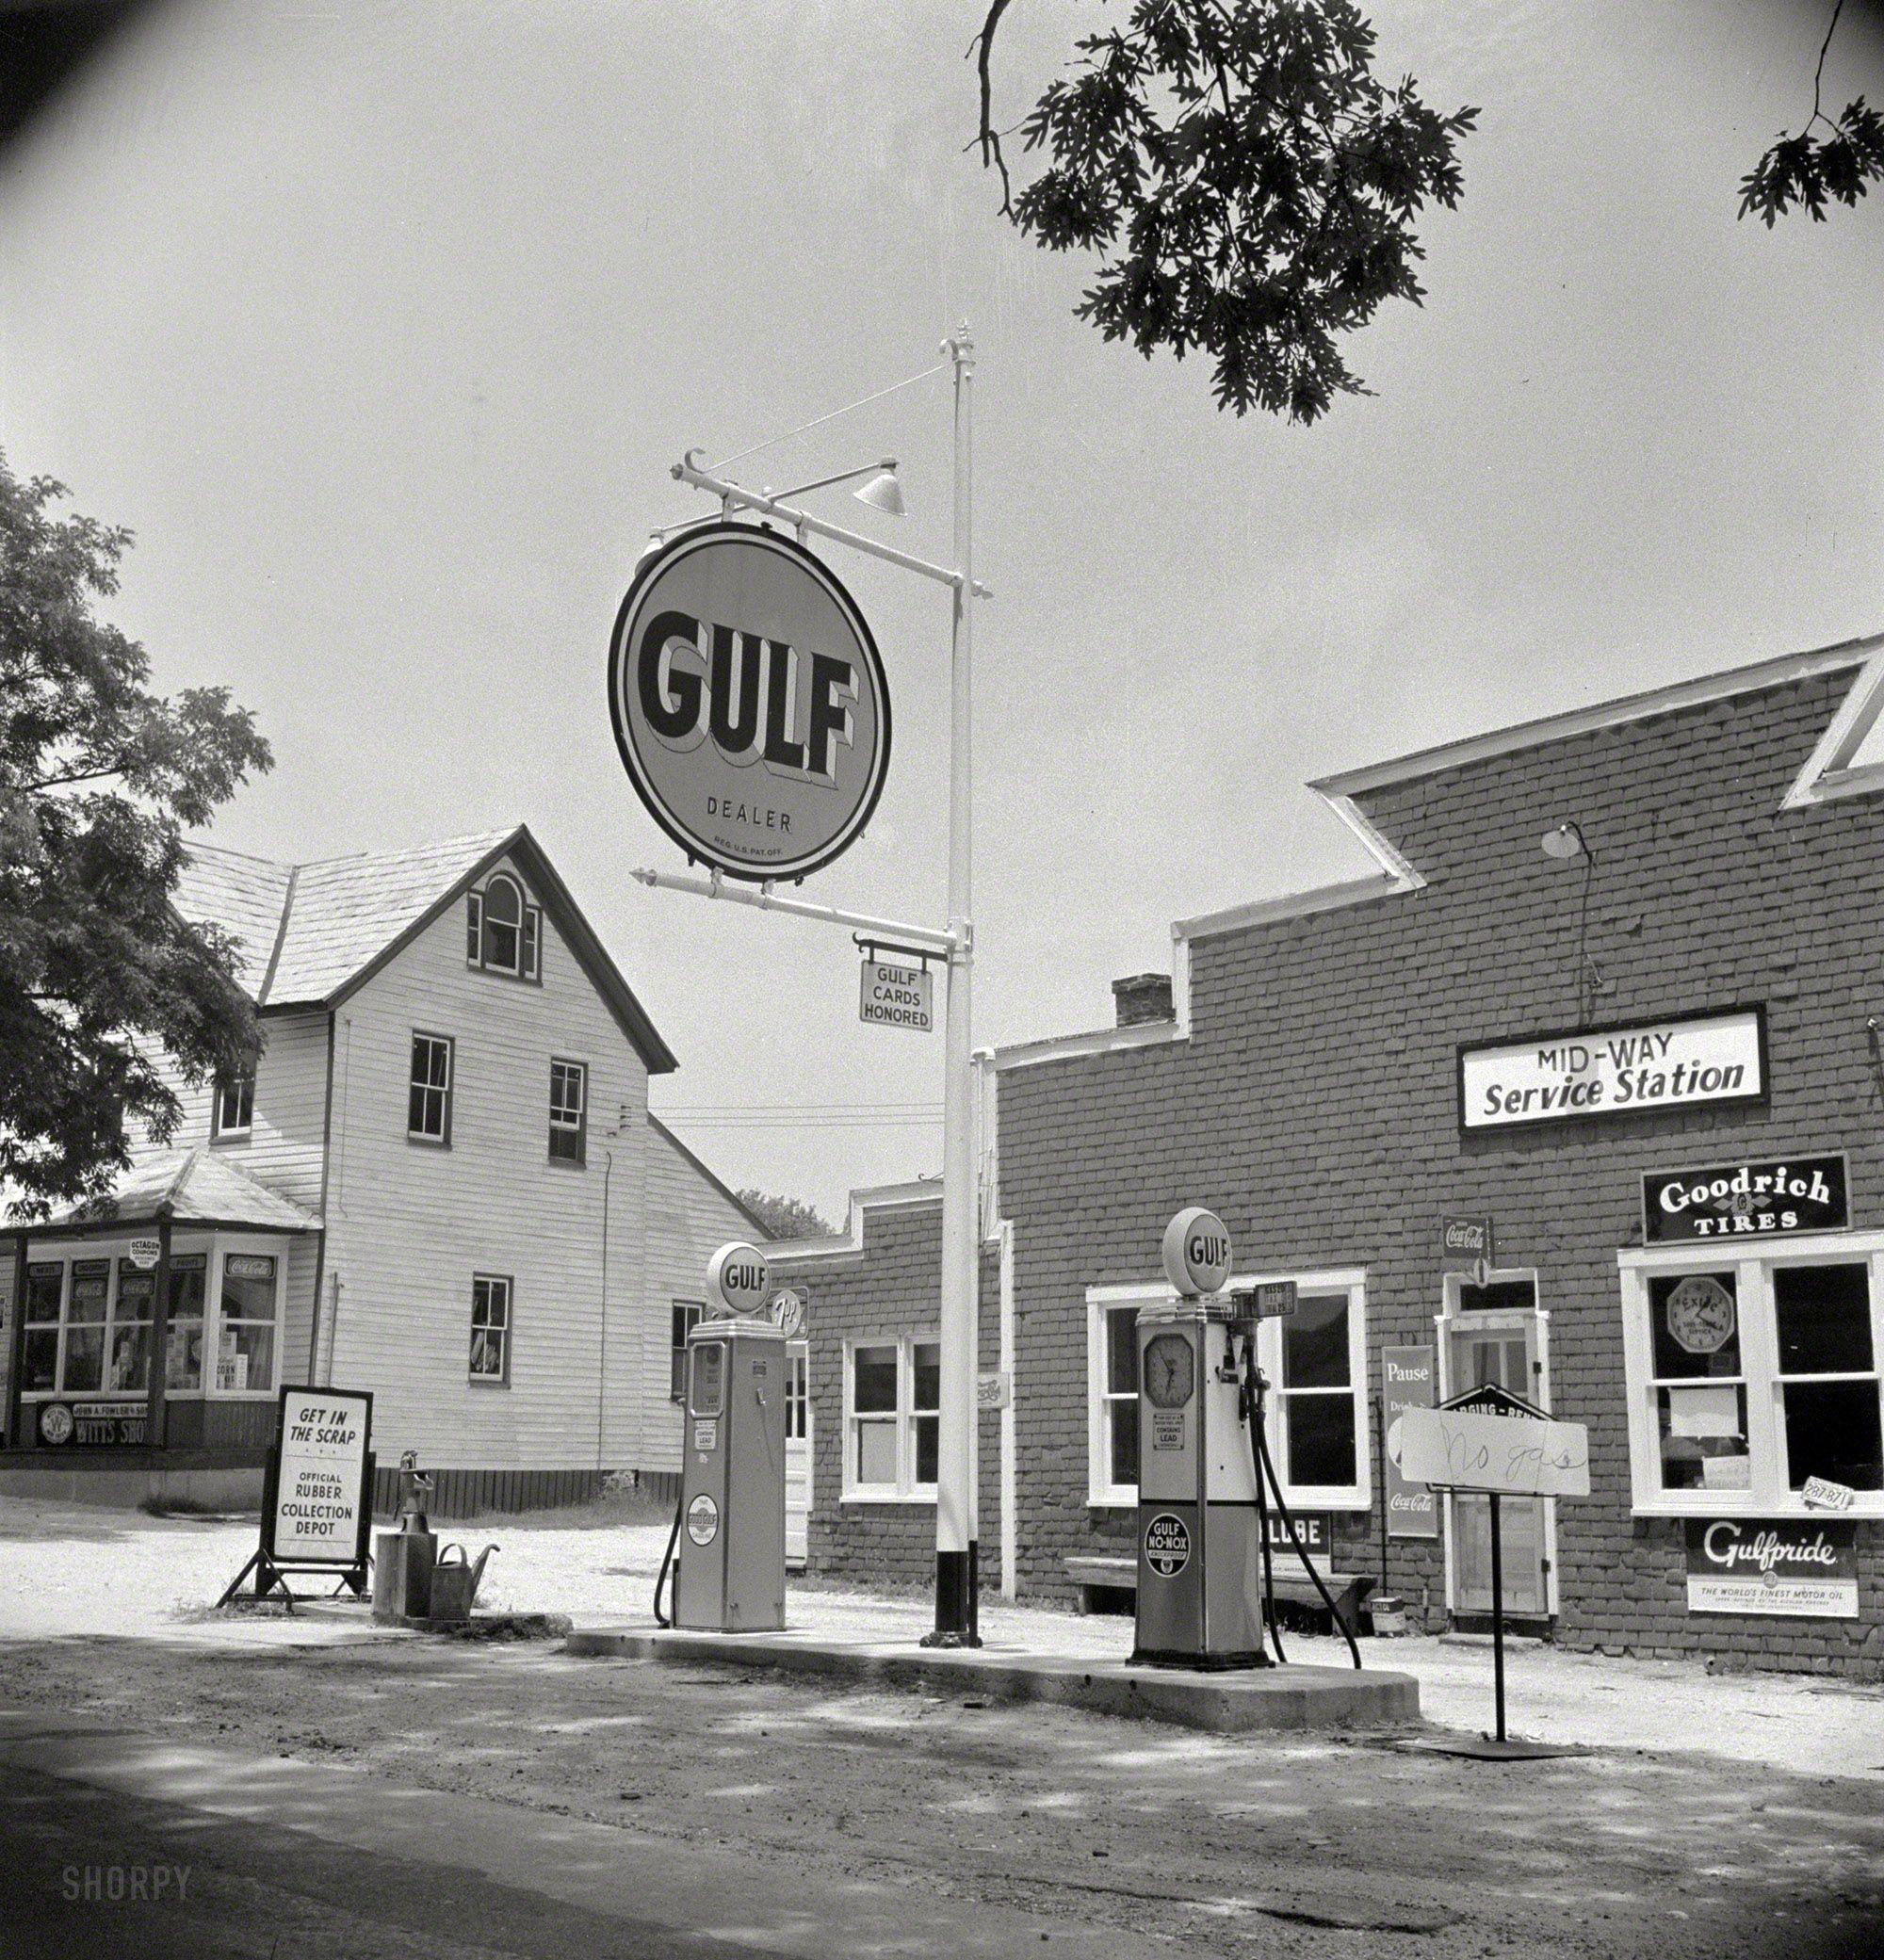 Marjory Collins - Gasoline service station in Mechanicsville, Maryland (july 1942)